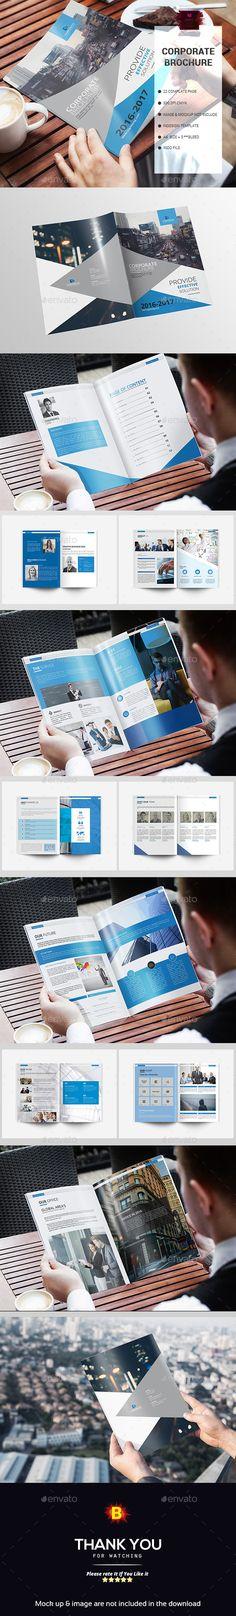 Brochure — InDesign INDD #classic brochure • Download ➝ https://graphicriver.net/item/brochure/18859964?ref=pxcr